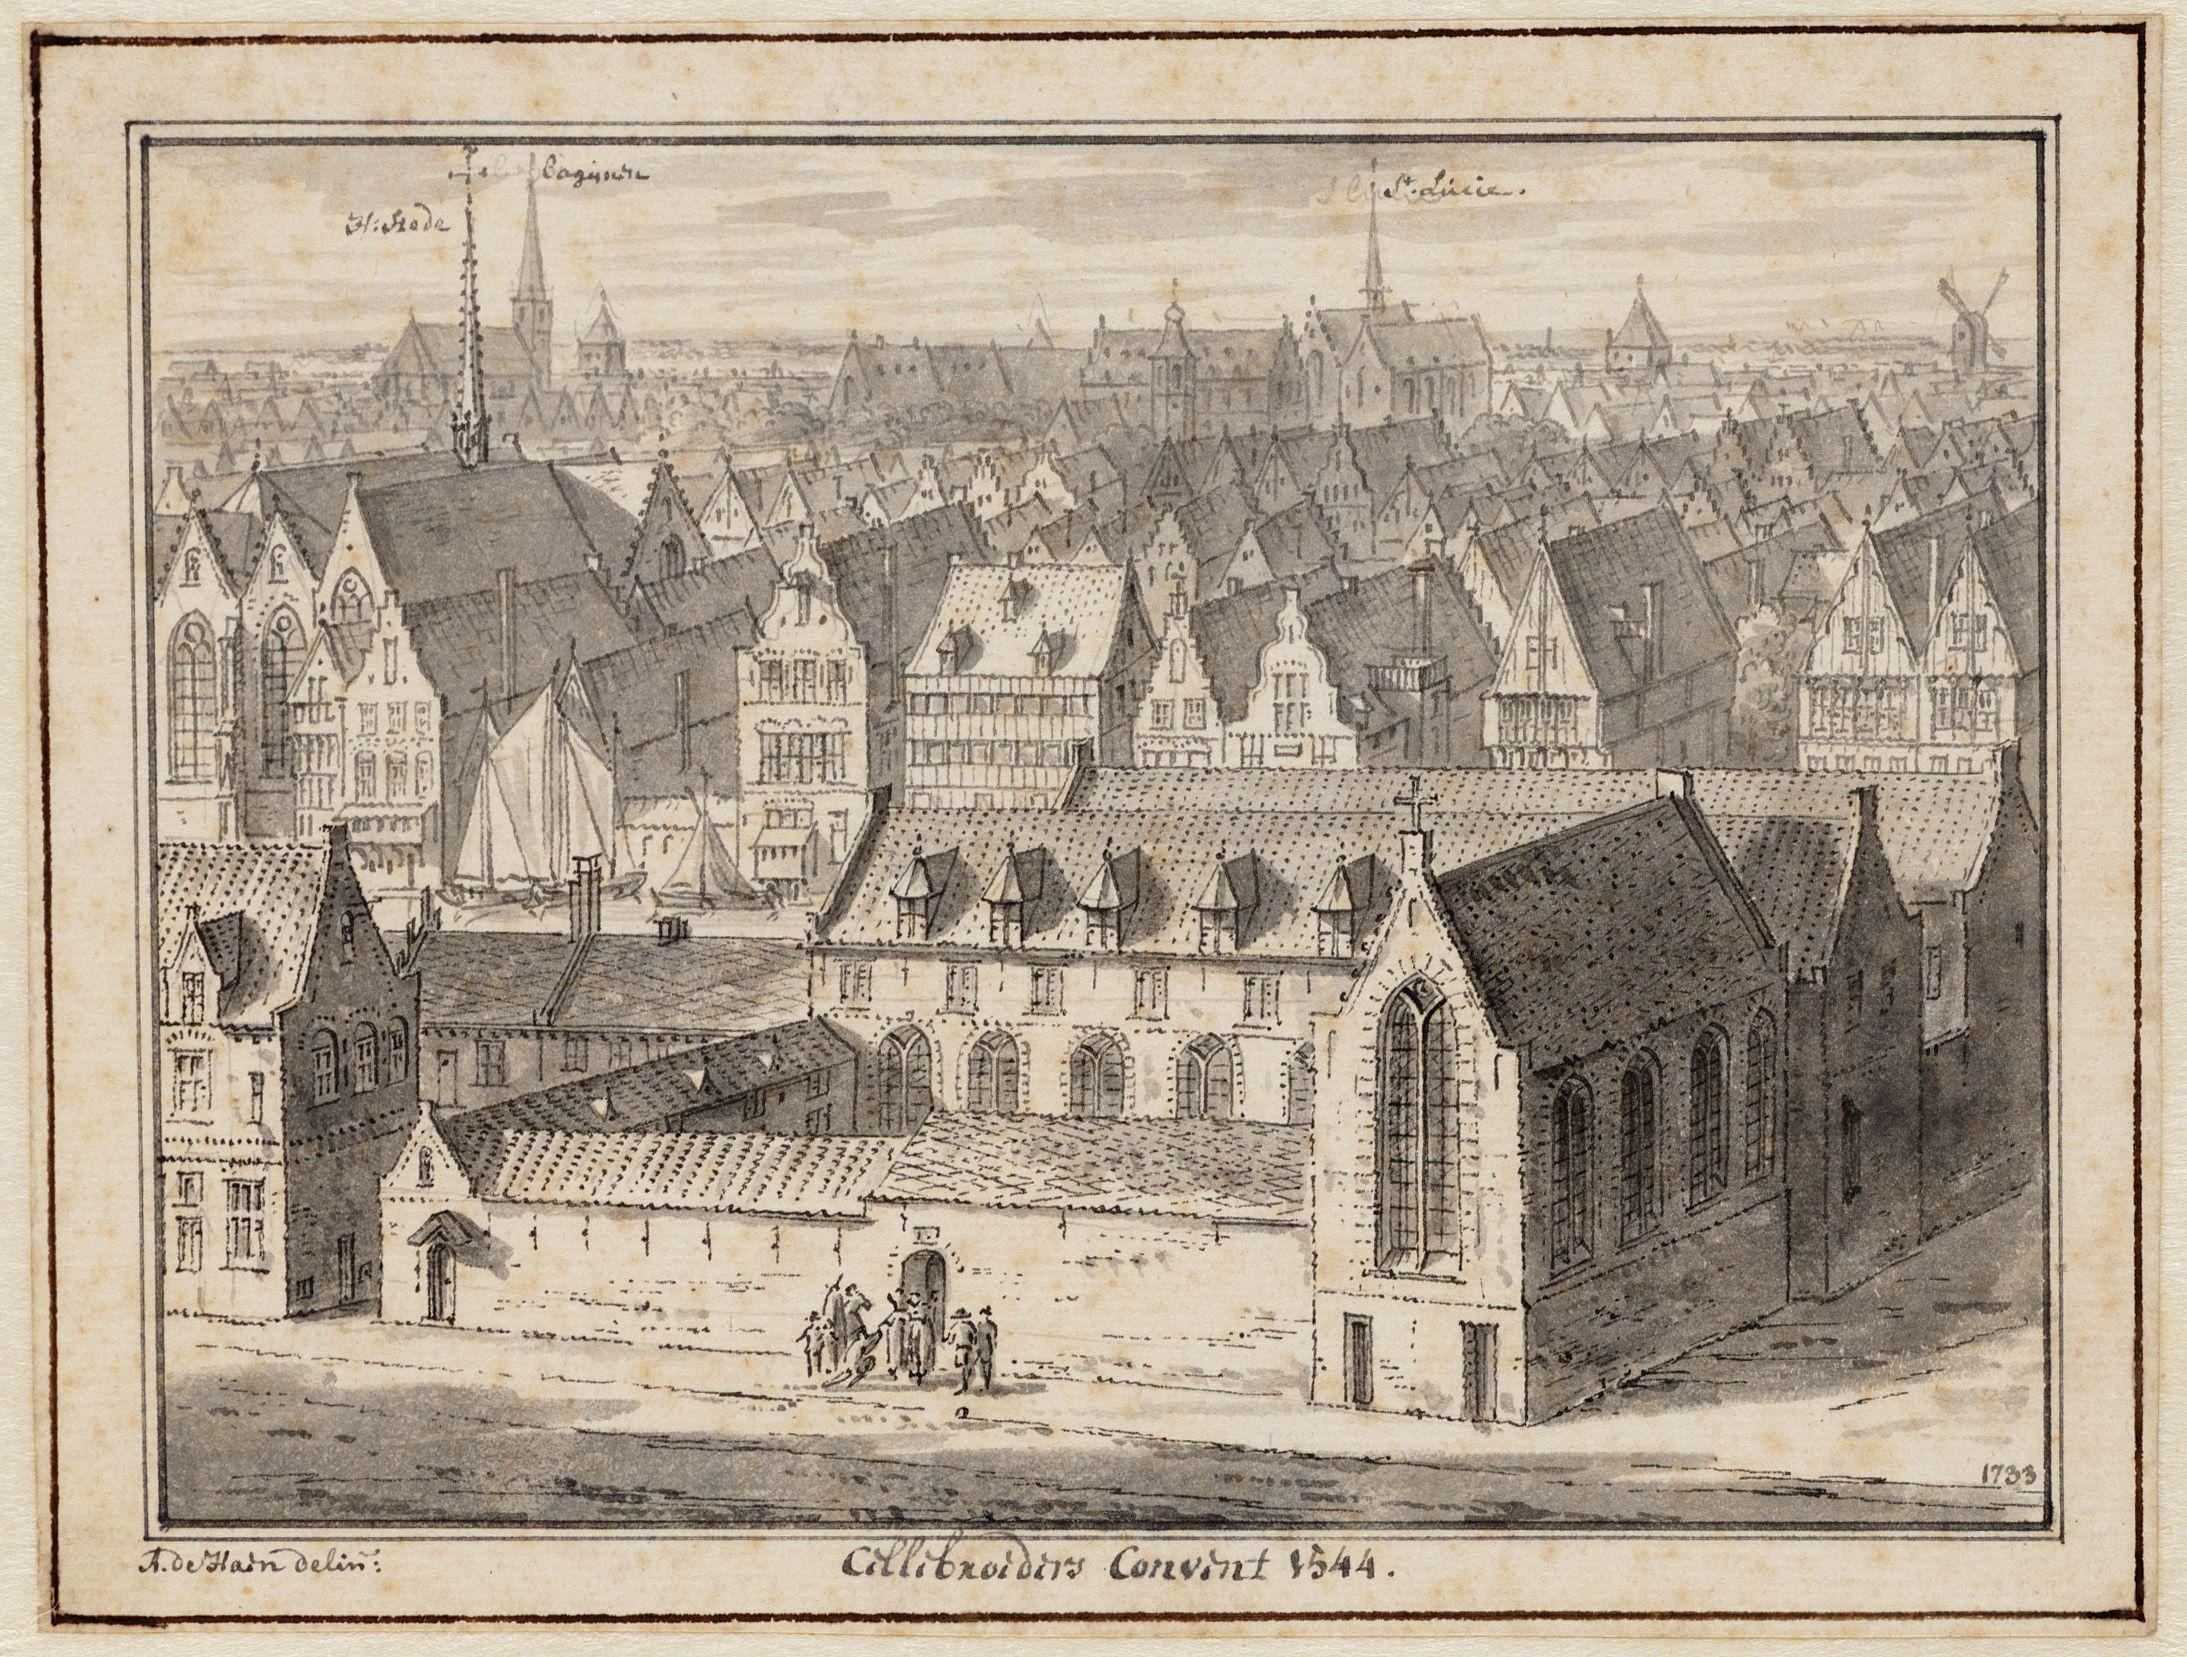 File:A. de Haan Cellebroeders Convent Amsterdam 1544.jpg